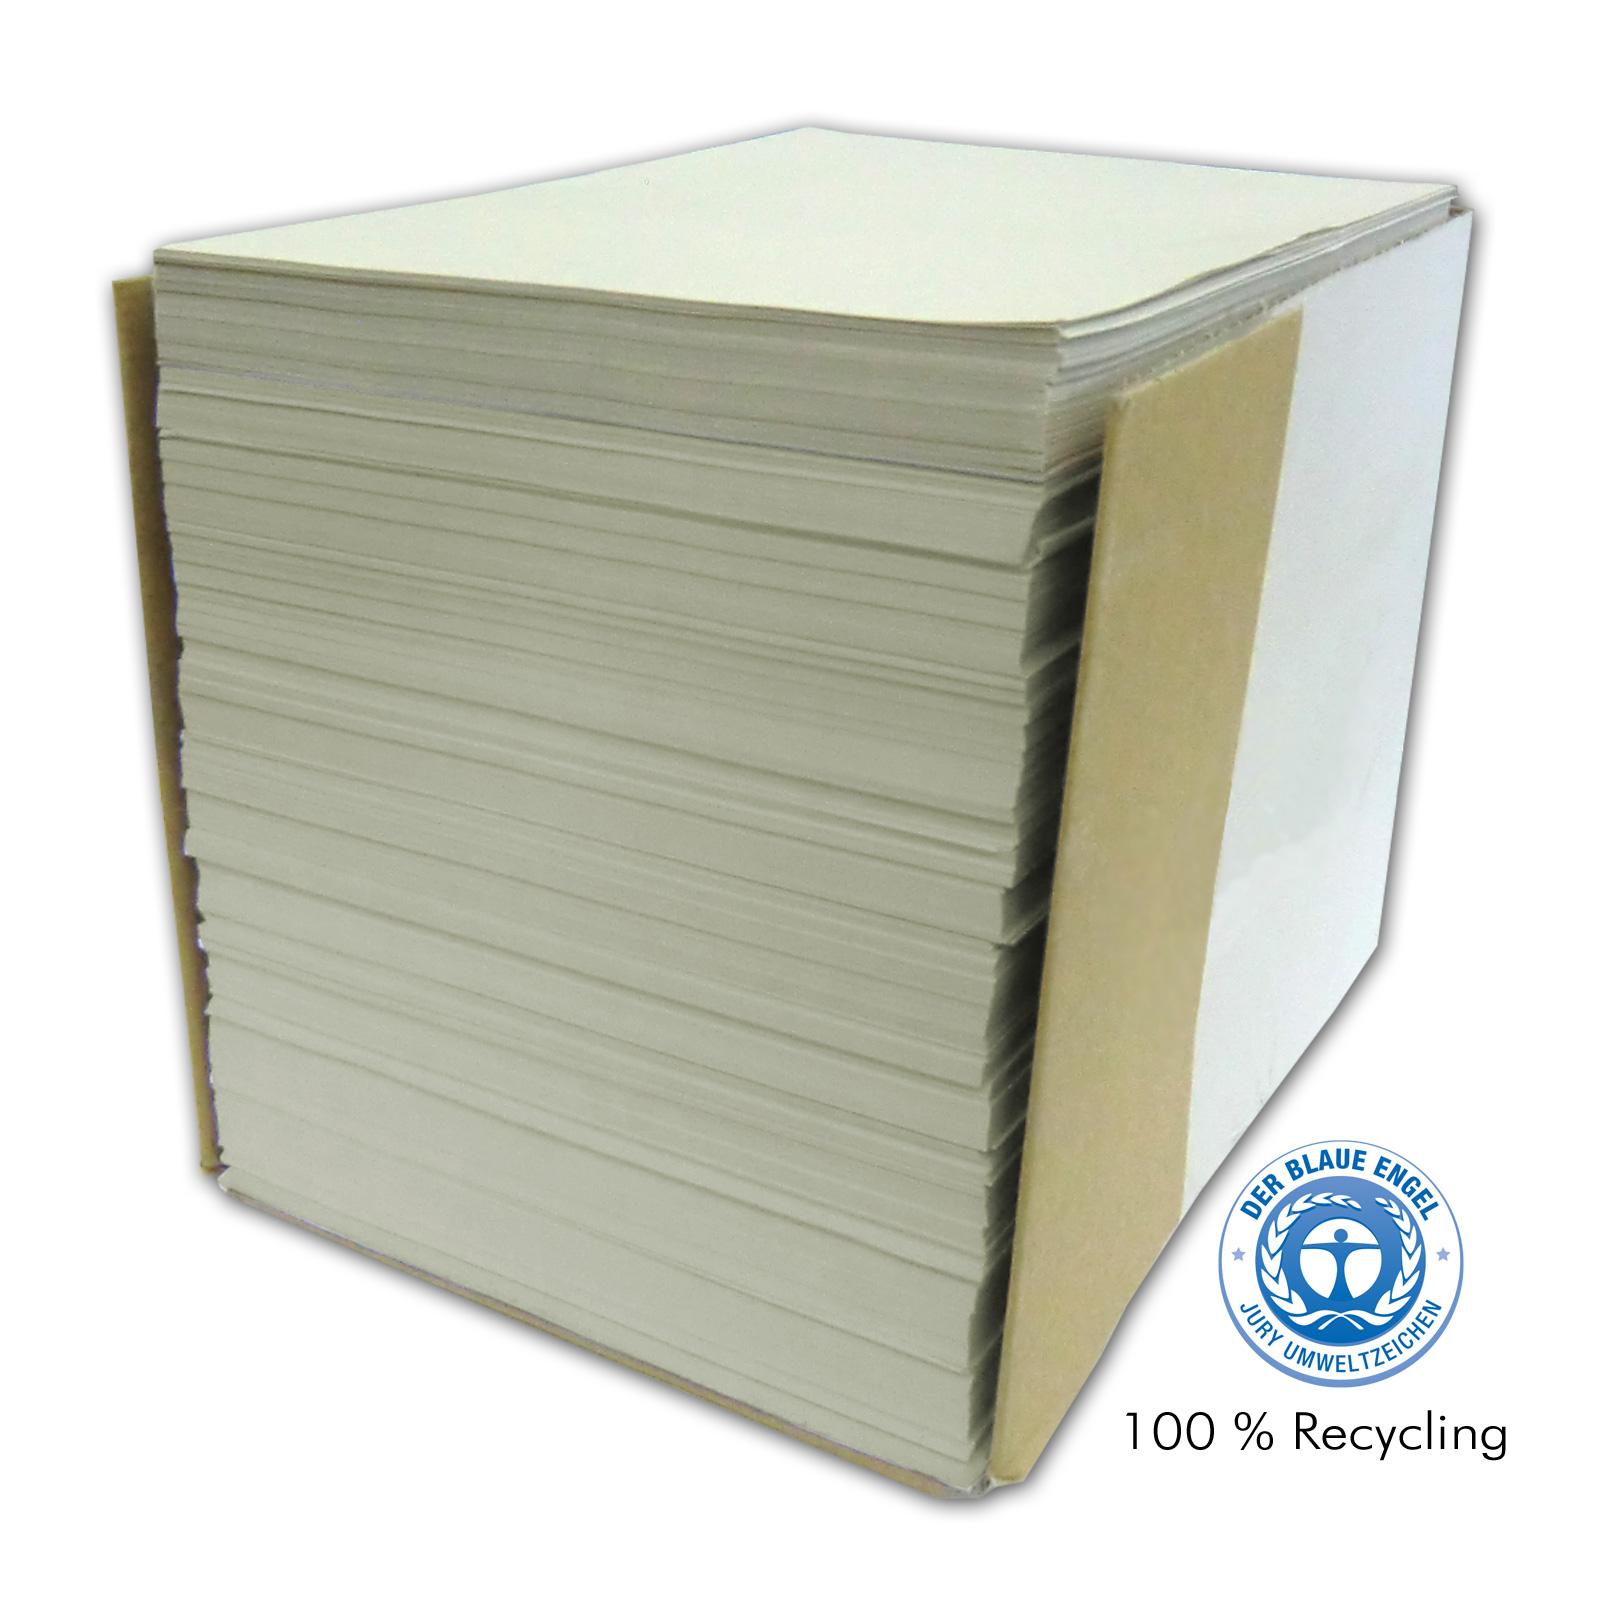 recycling kopierpapier iso 80 wei din a4 80g m laser. Black Bedroom Furniture Sets. Home Design Ideas